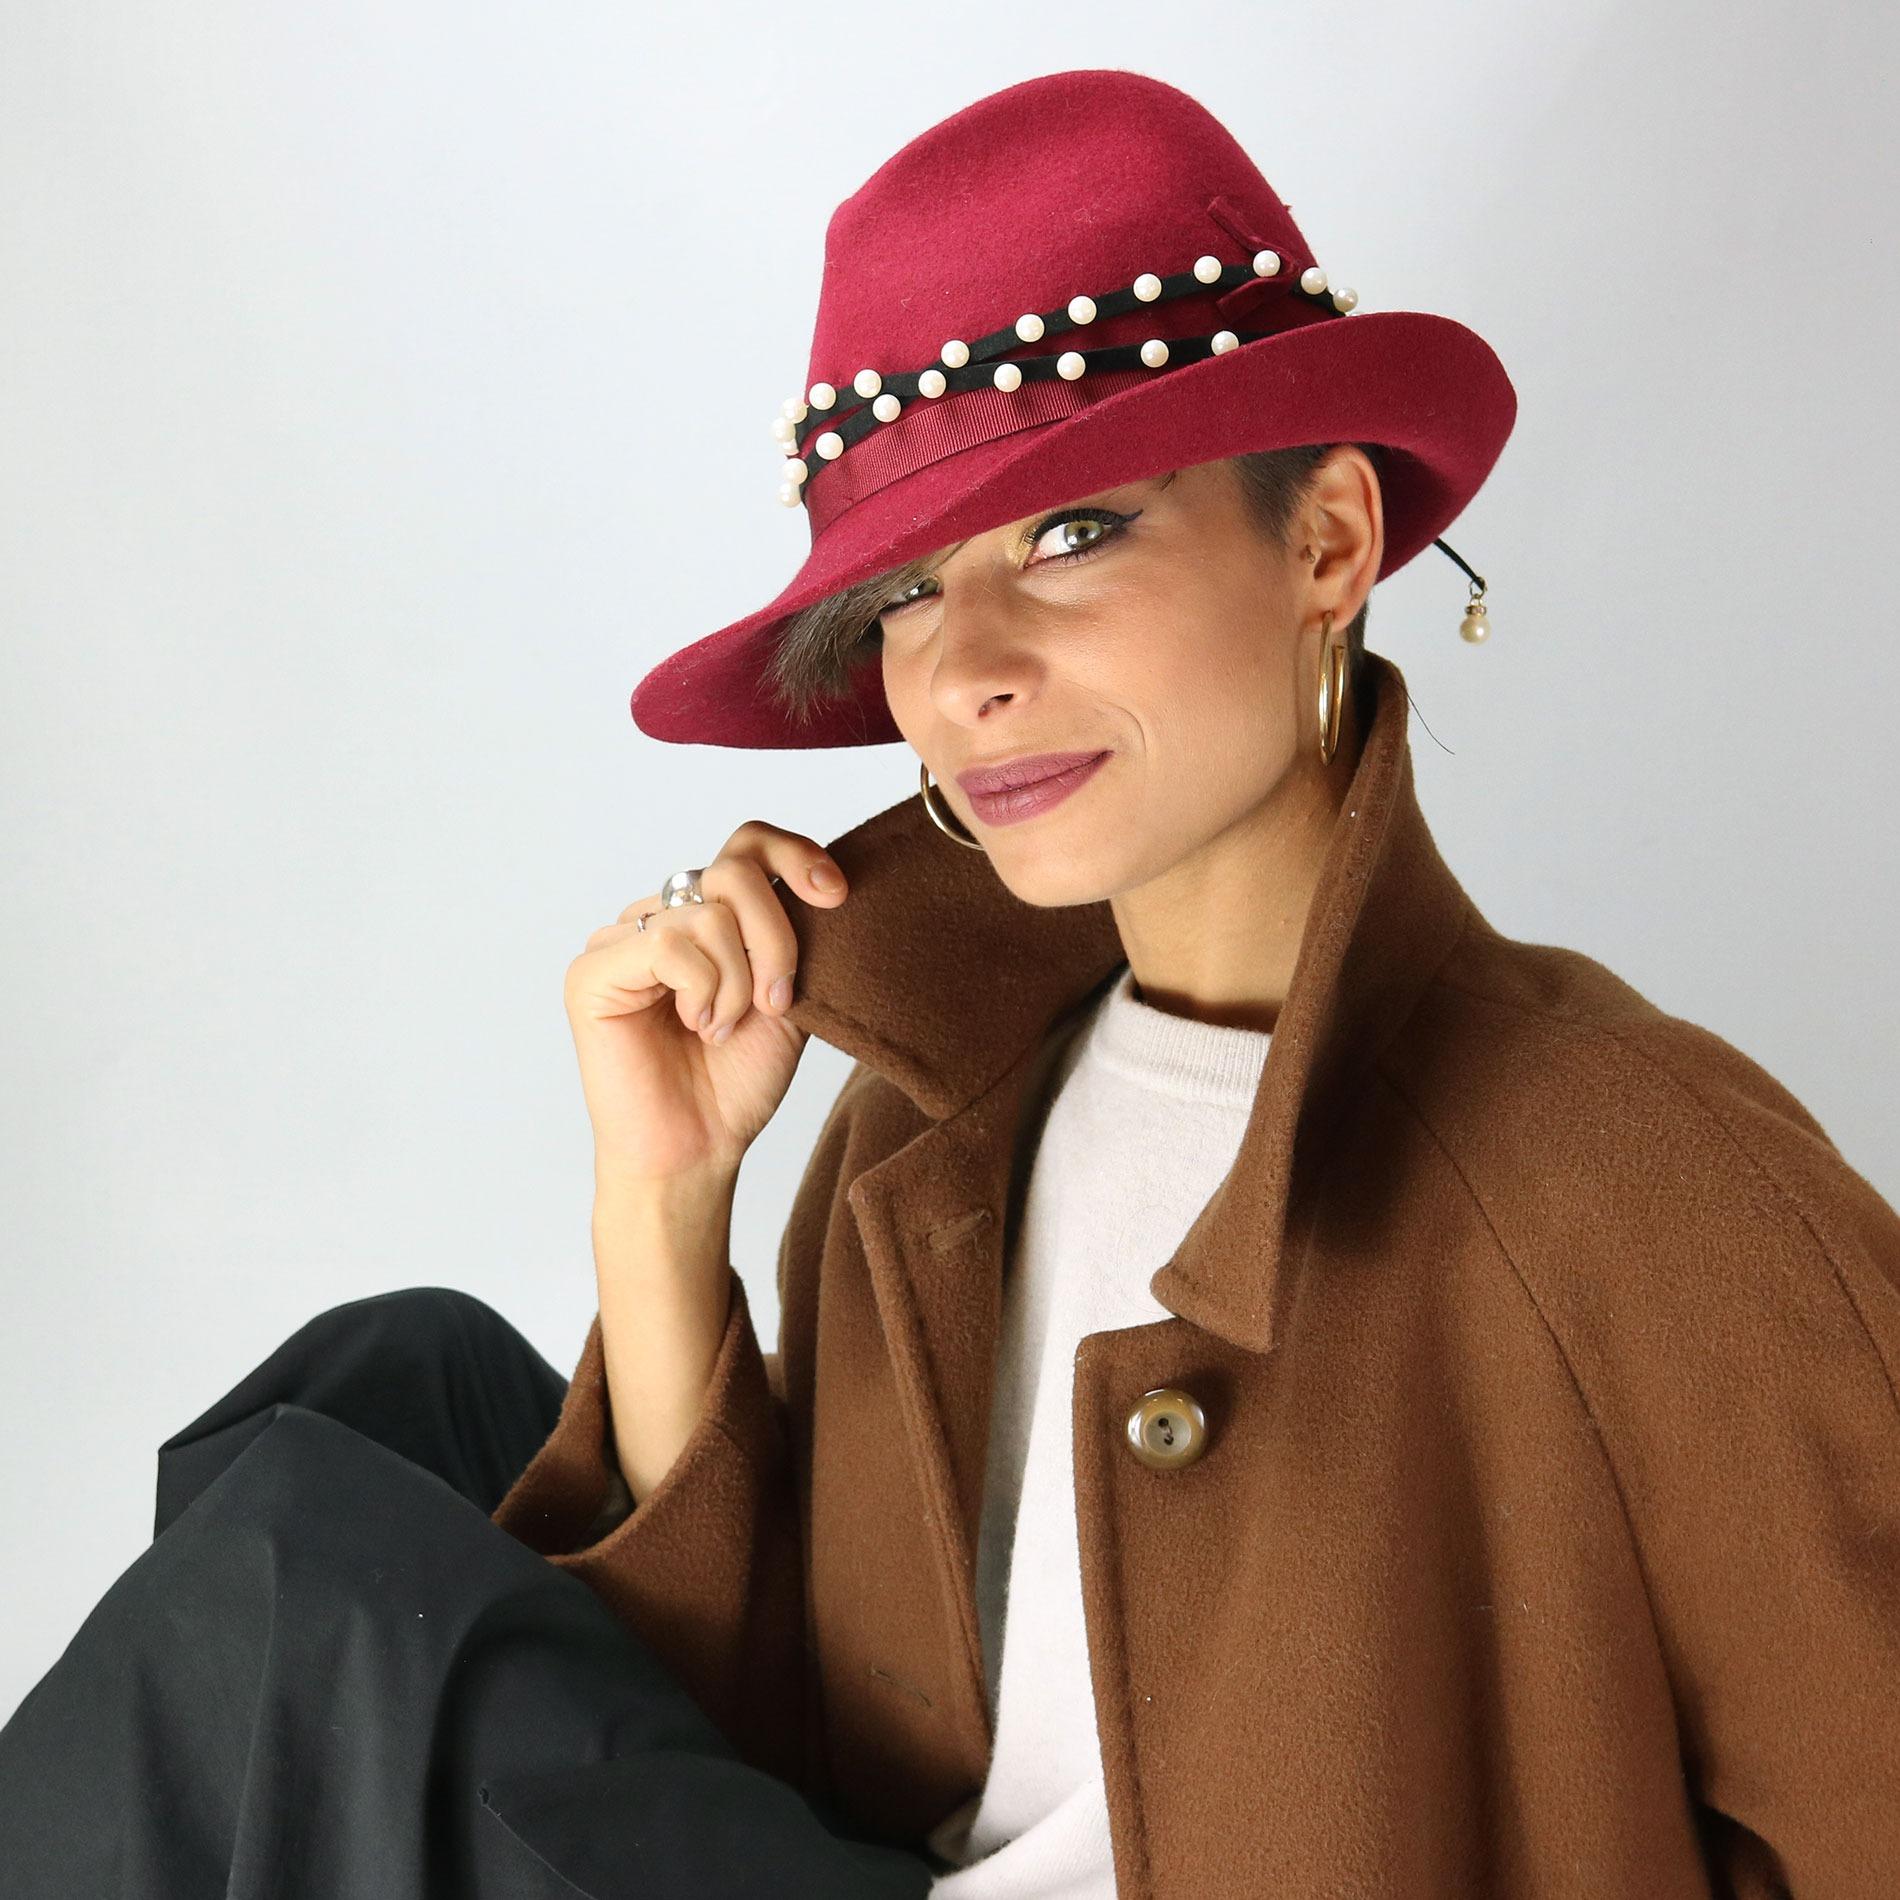 Cappello bordeaux invernale in feltro con perline 910c8a33318d